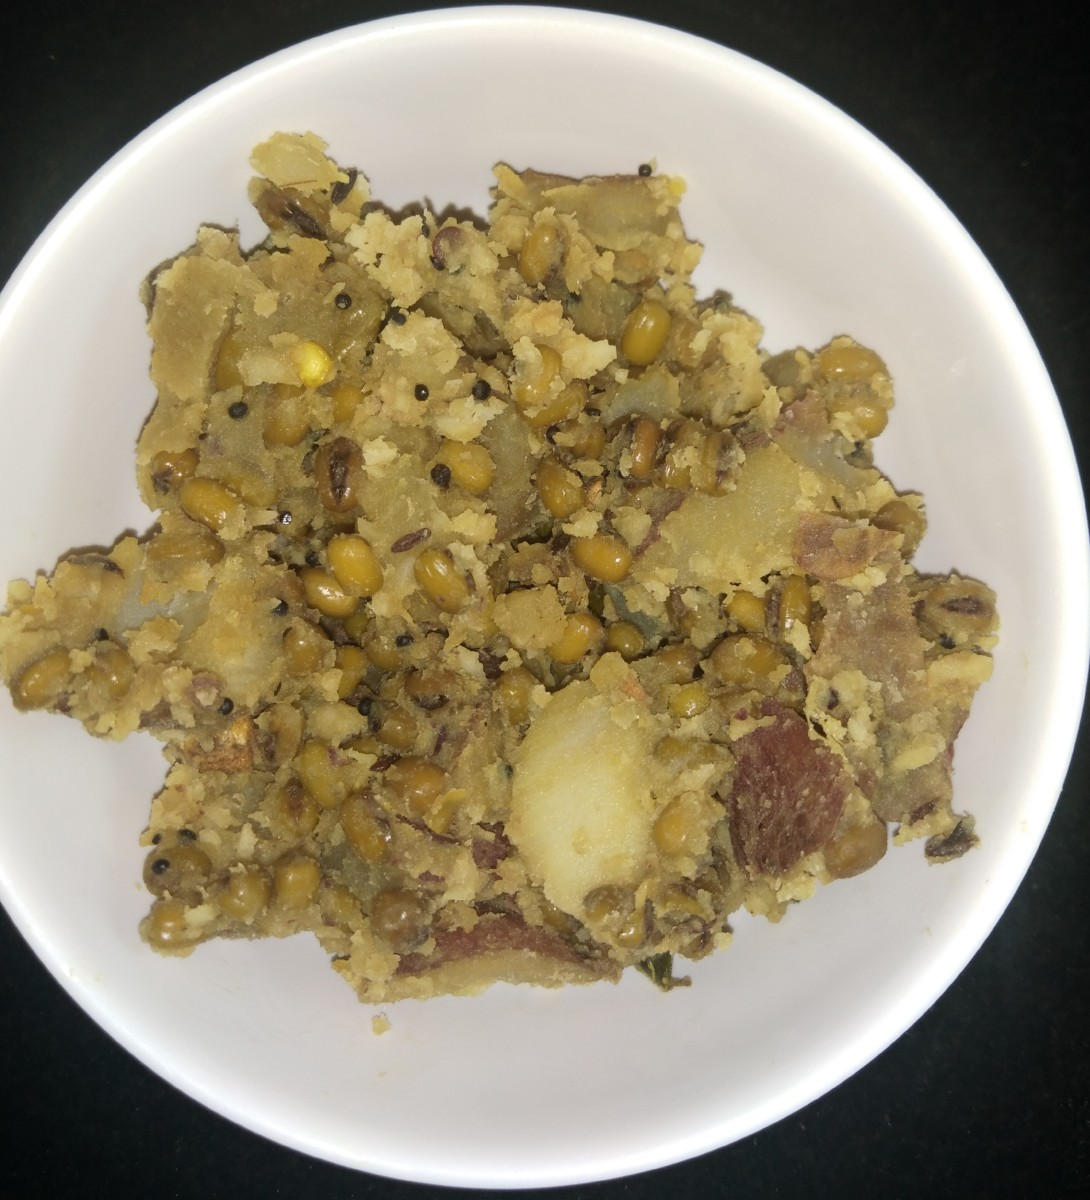 Sweet Potato and Green Gram Stir-Fry Recipe